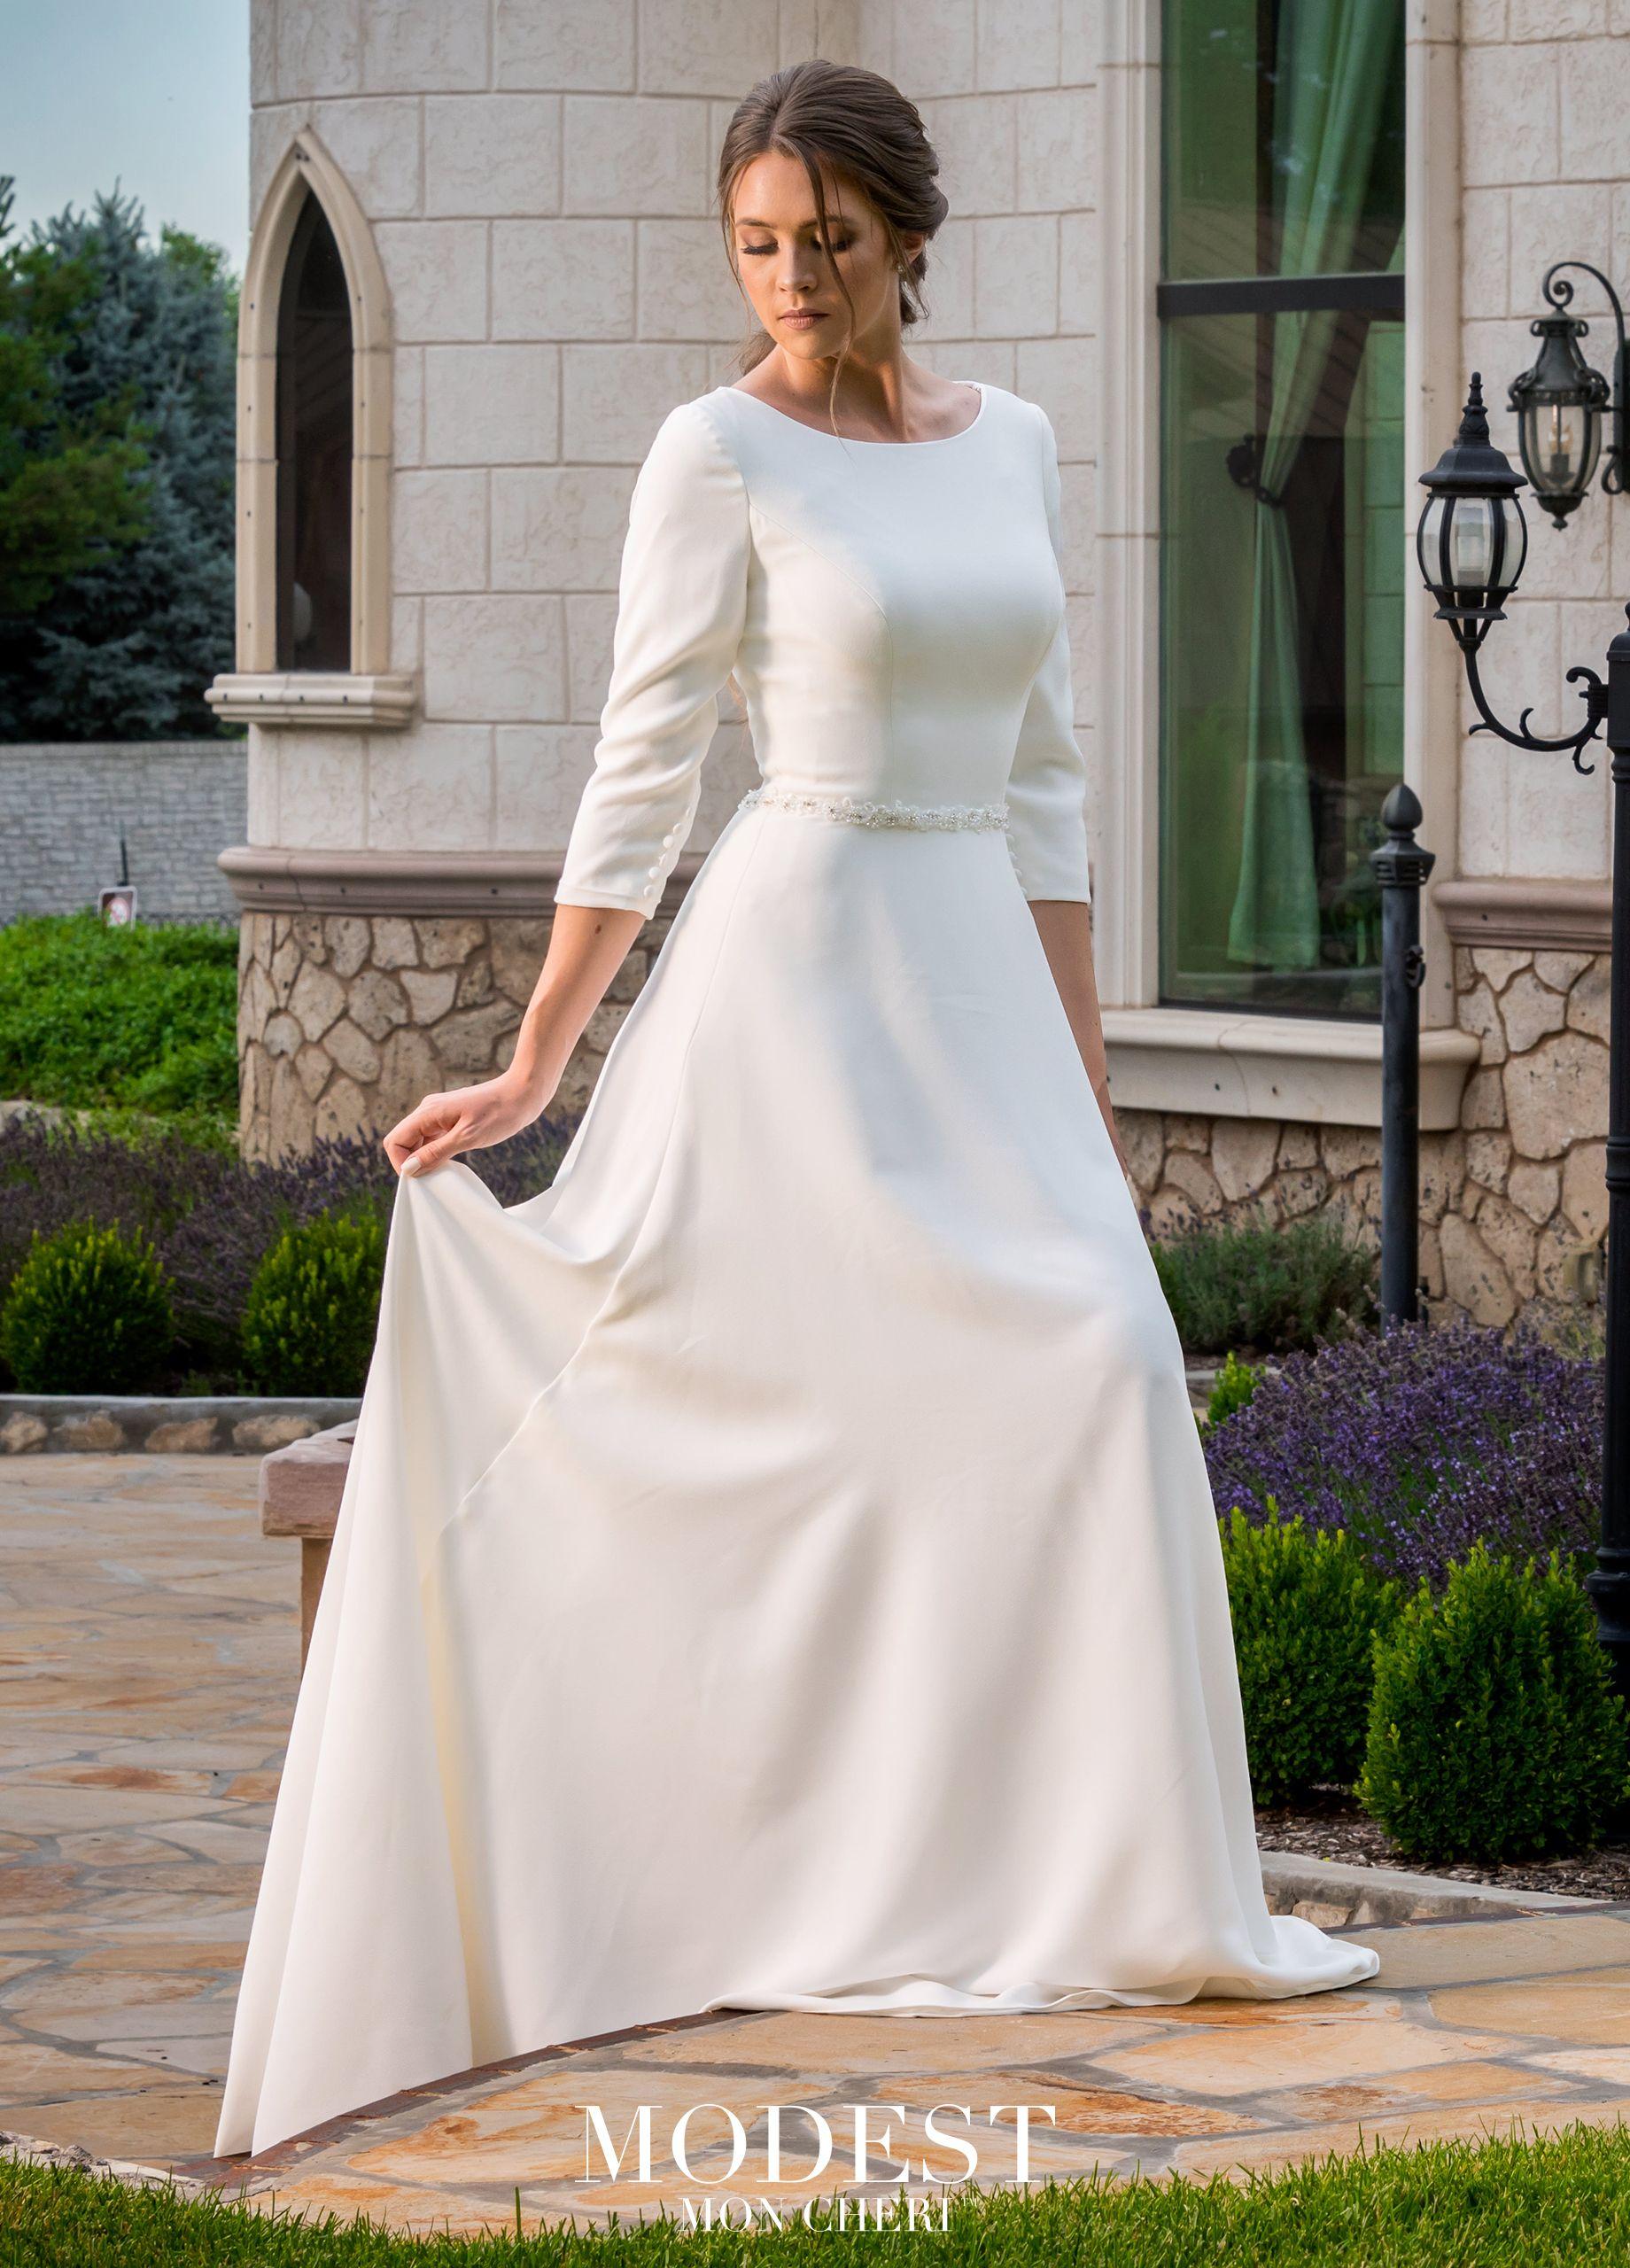 6206e29a66 TR11971 in 2019 | Wifey | Wedding dresses, Crepe wedding dress, Mon ...